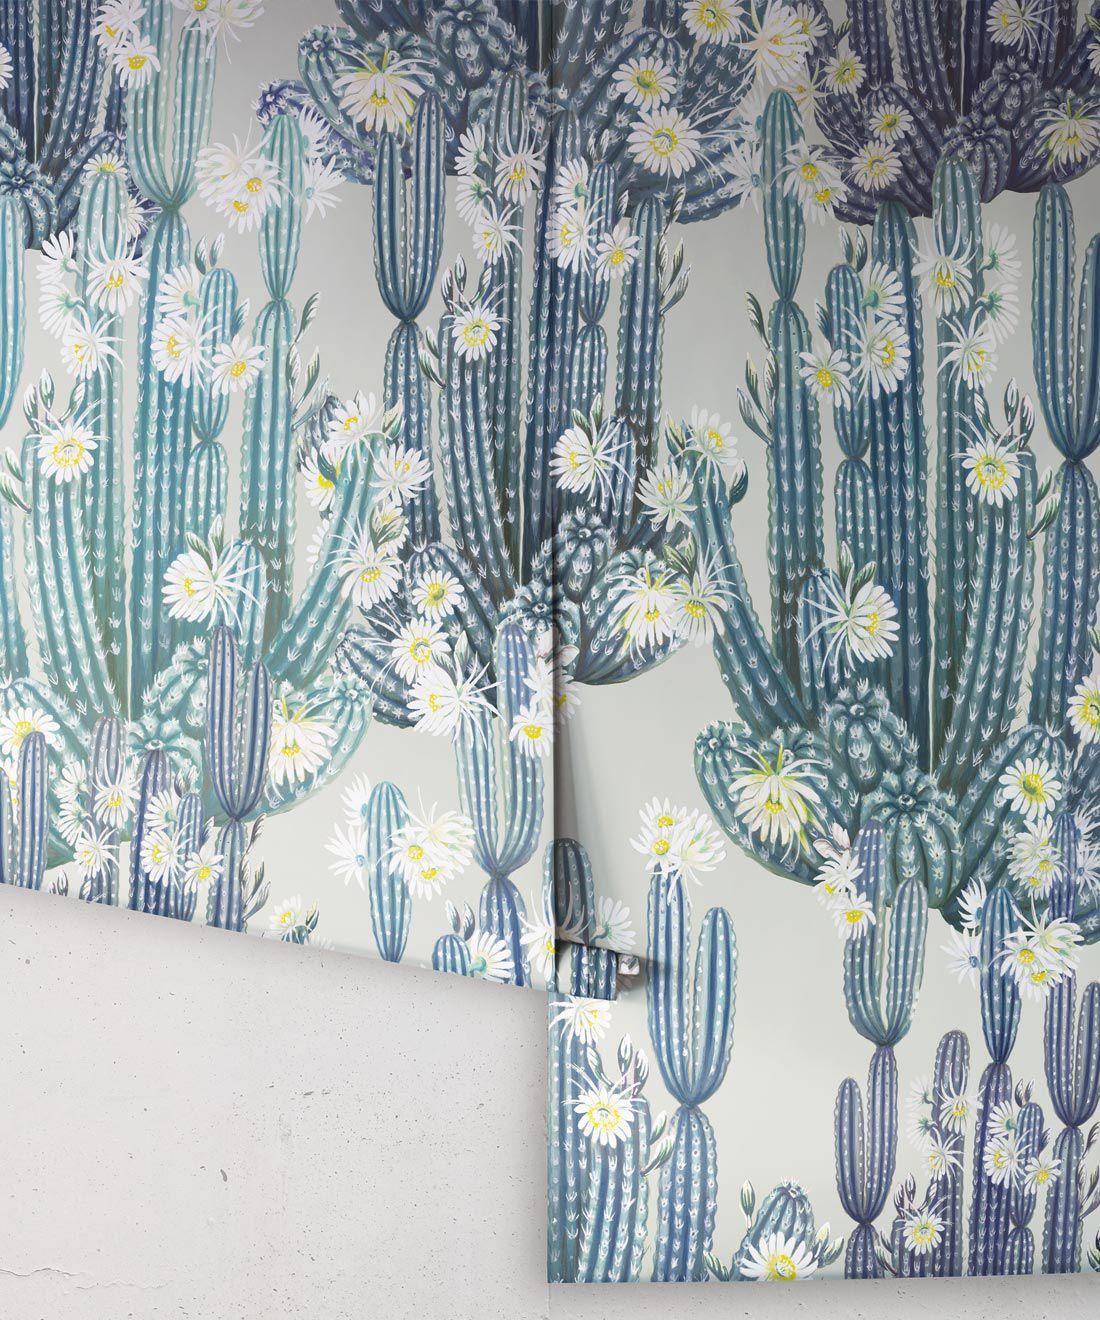 San Pedro Wallpaper Blue • Cactus Wallpaper • Succulents Wallpaper • Desert Wallpaper Rolls